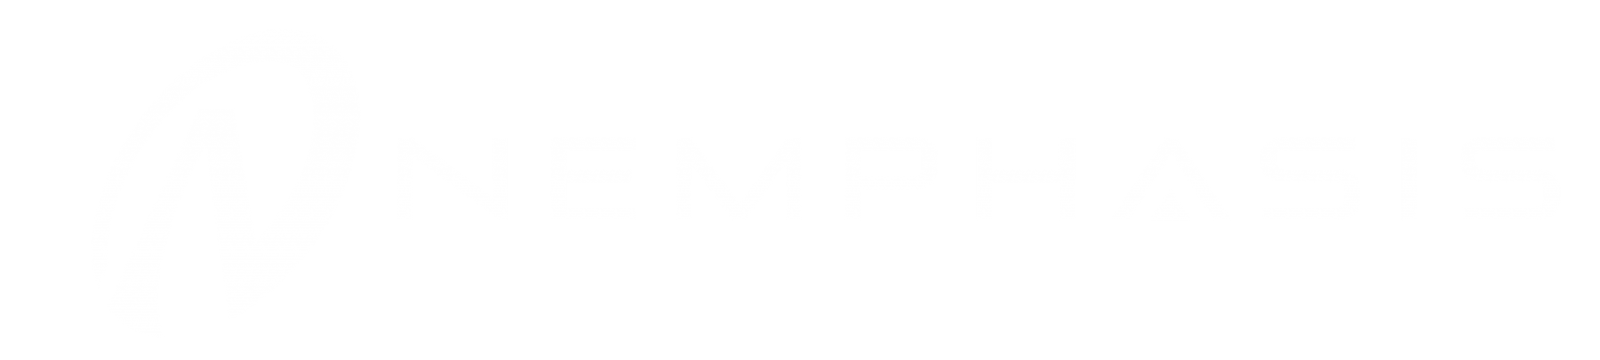 Nemphasis